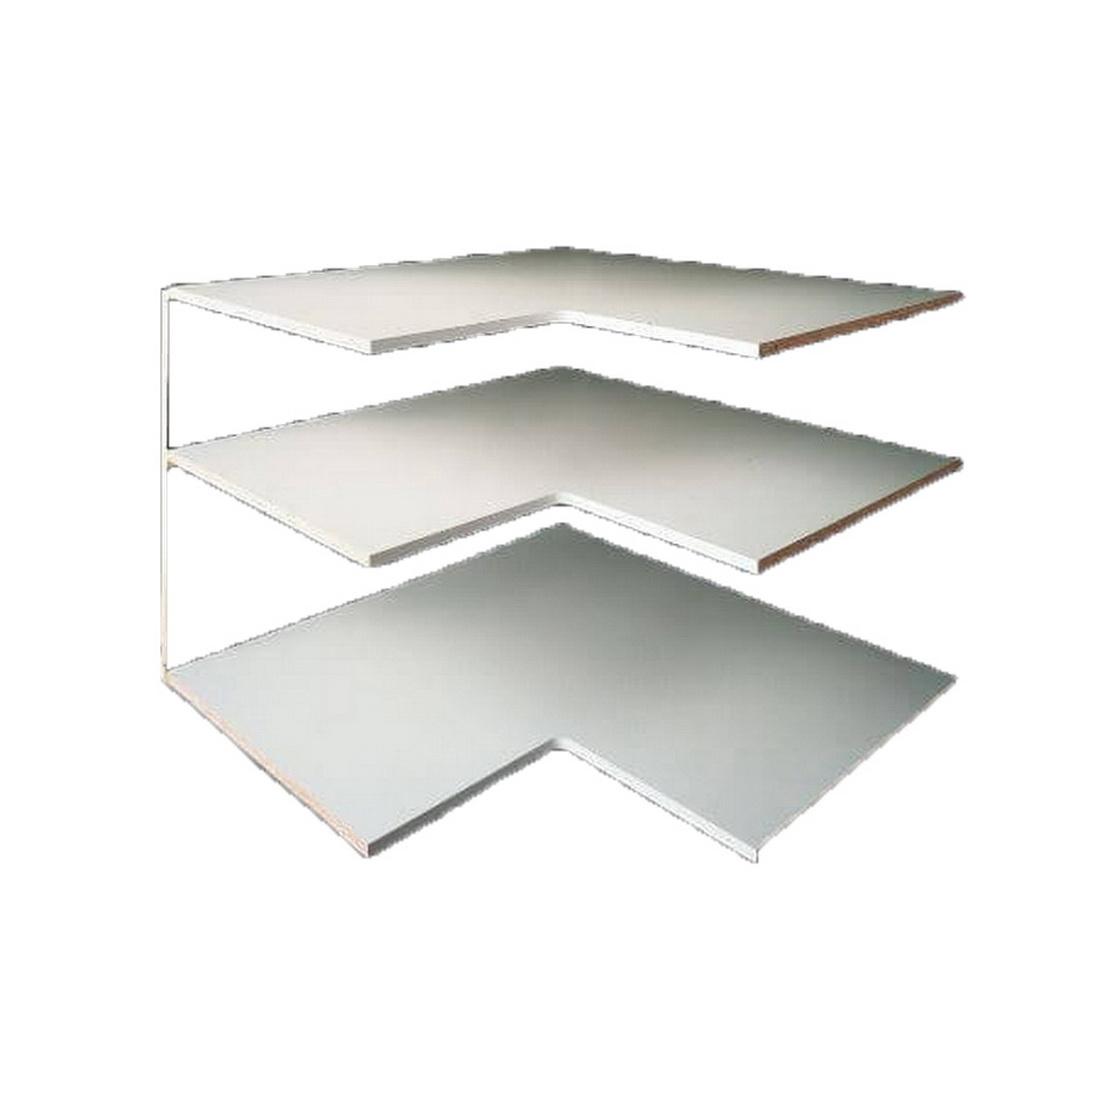 Laminex Whiteboard MDF Panel 2440 x 1220 x 12mm Satin 872165